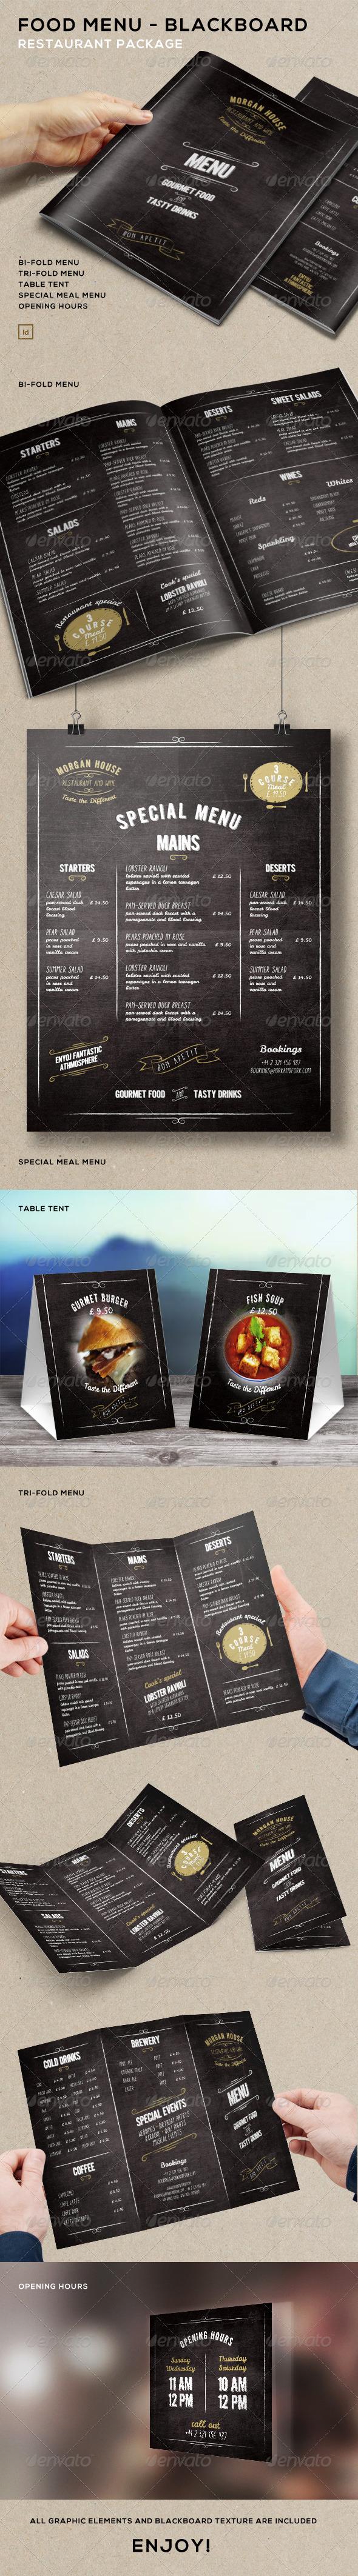 GraphicRiver Food Menu BlackBoard Restaurant Package 7819673